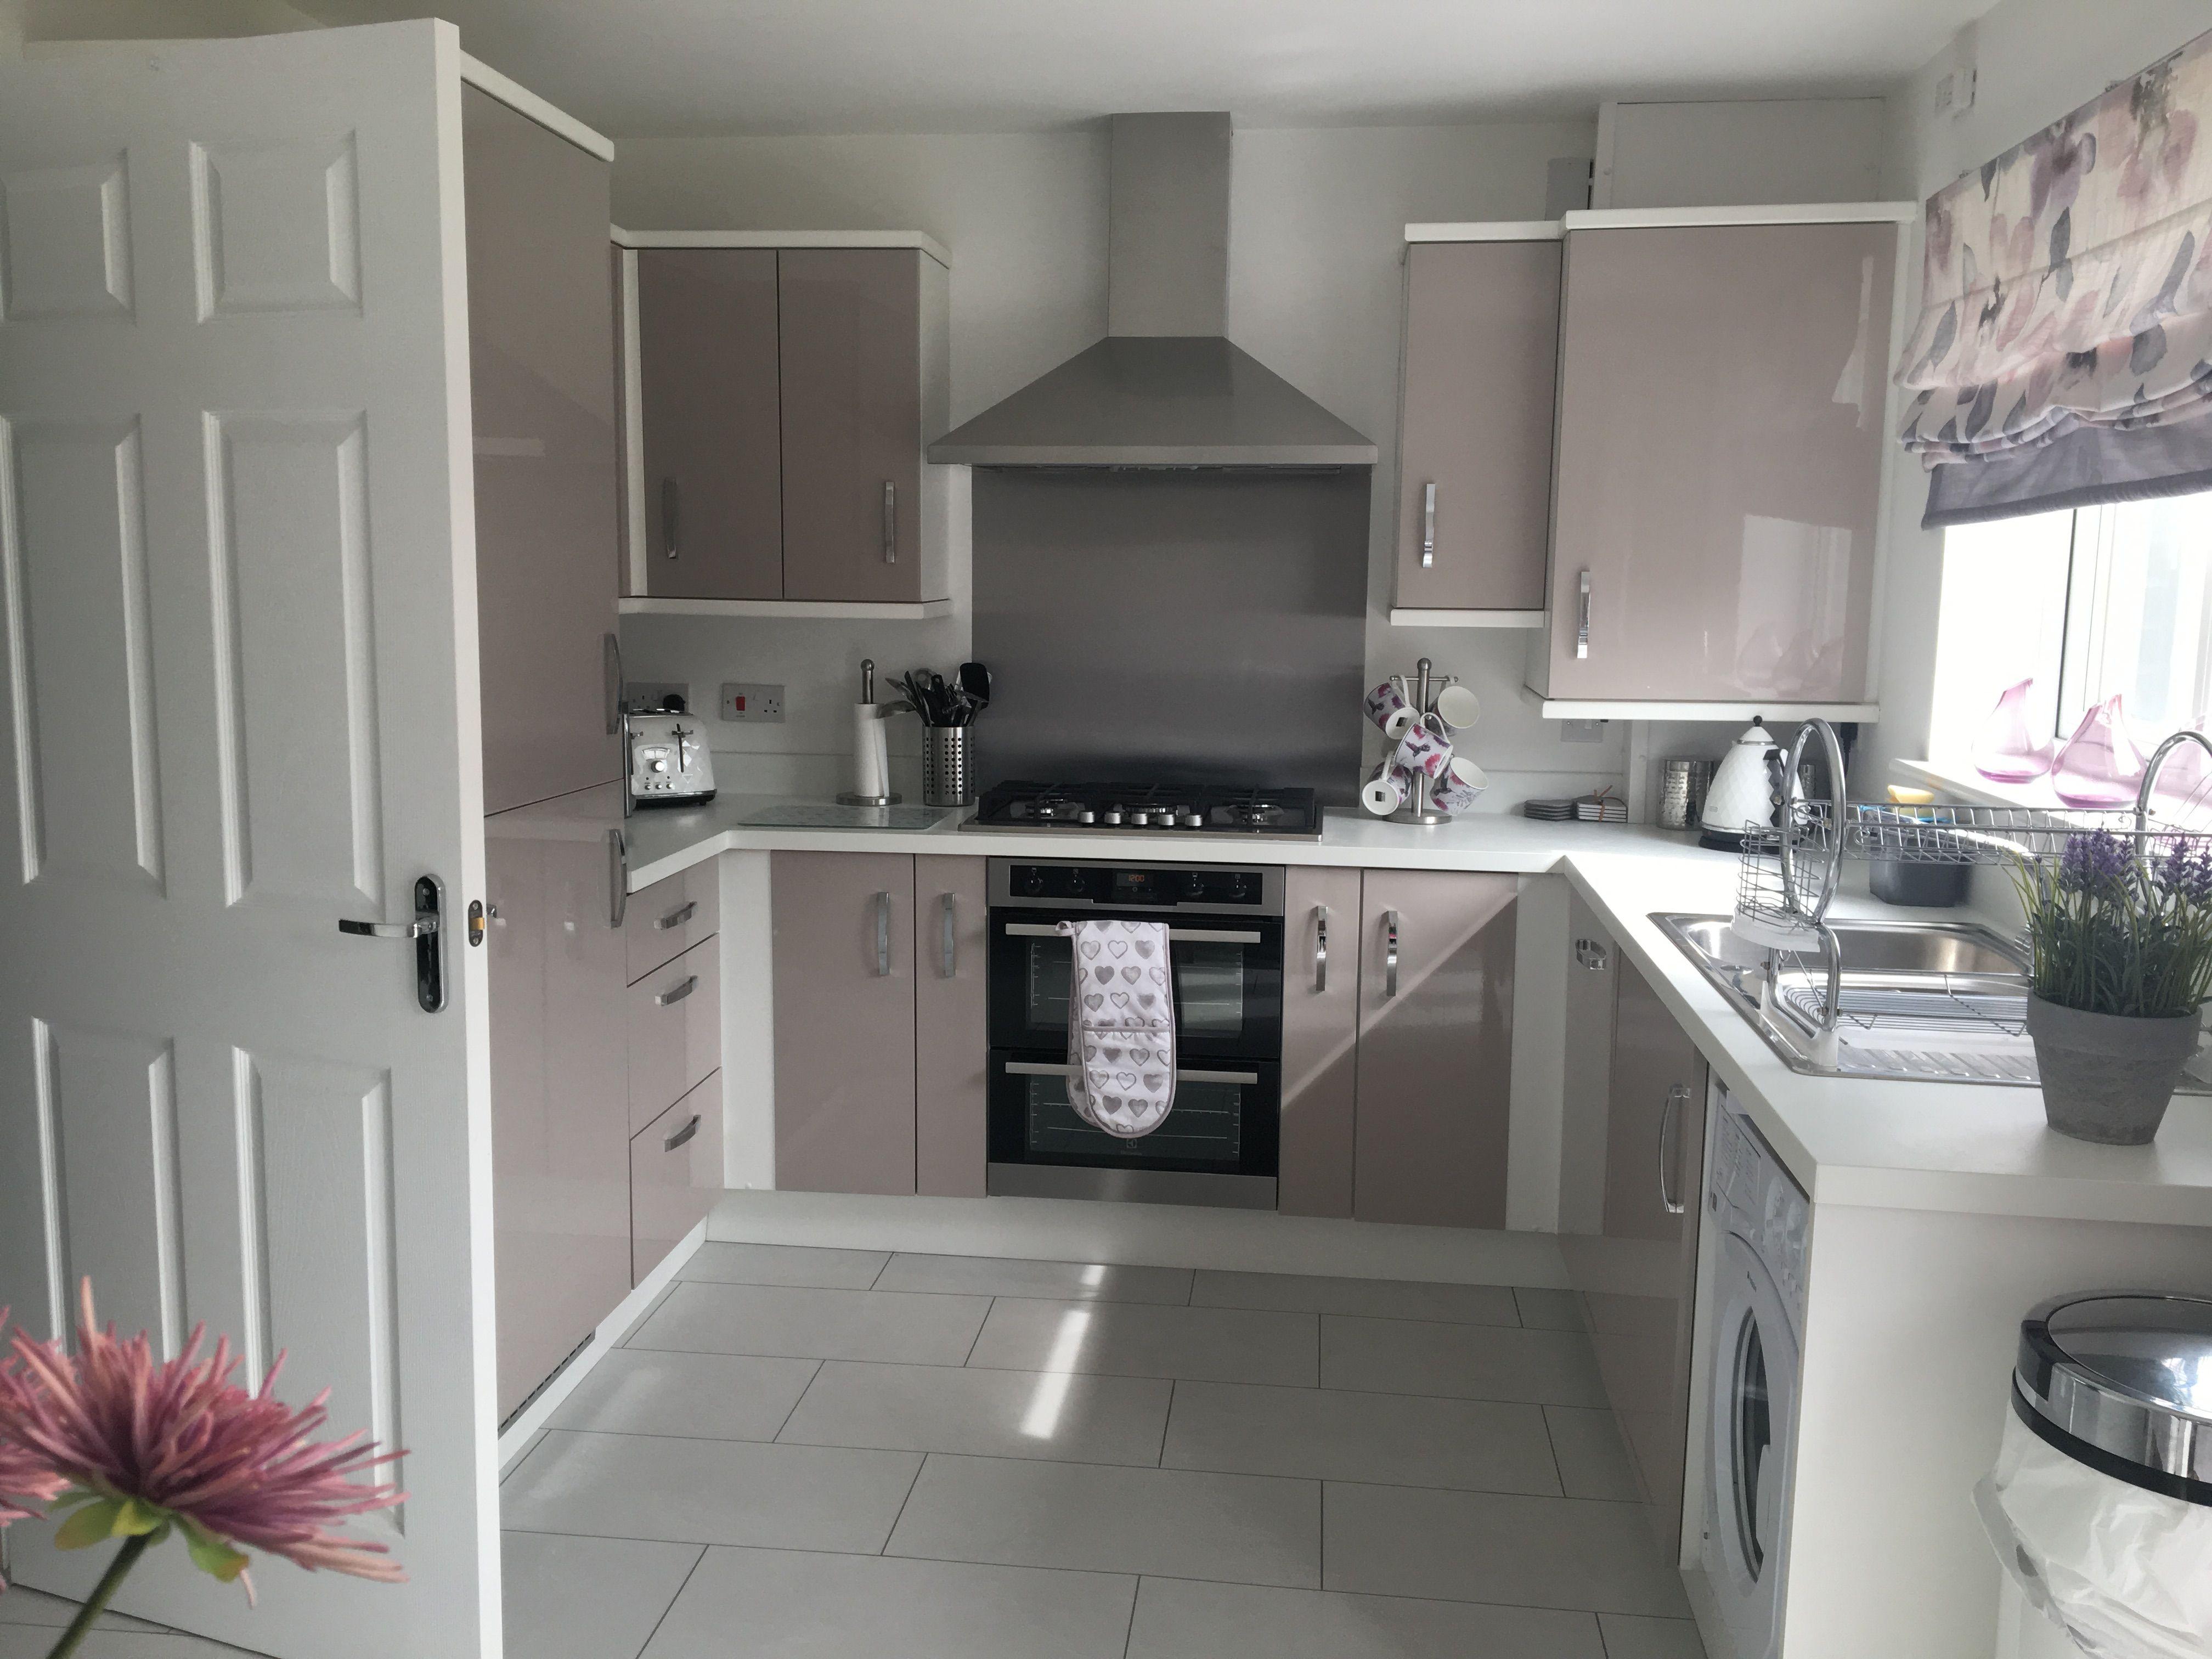 Colour scheme kitchen pinterest kitchens house and kitchen